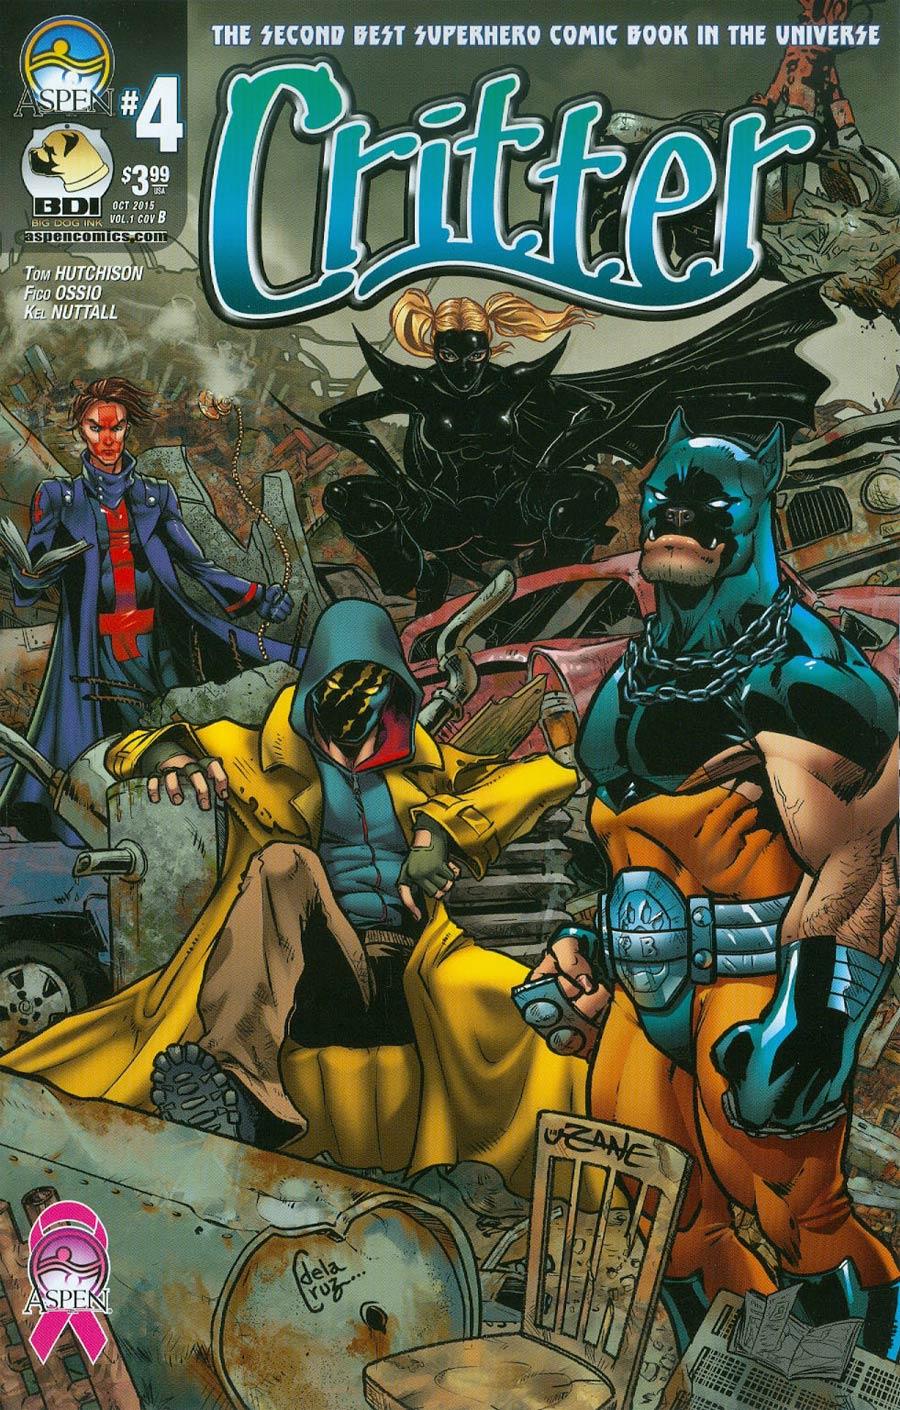 Critter Vol 3 #4 Cover B Variant Corey Zayatz Cover